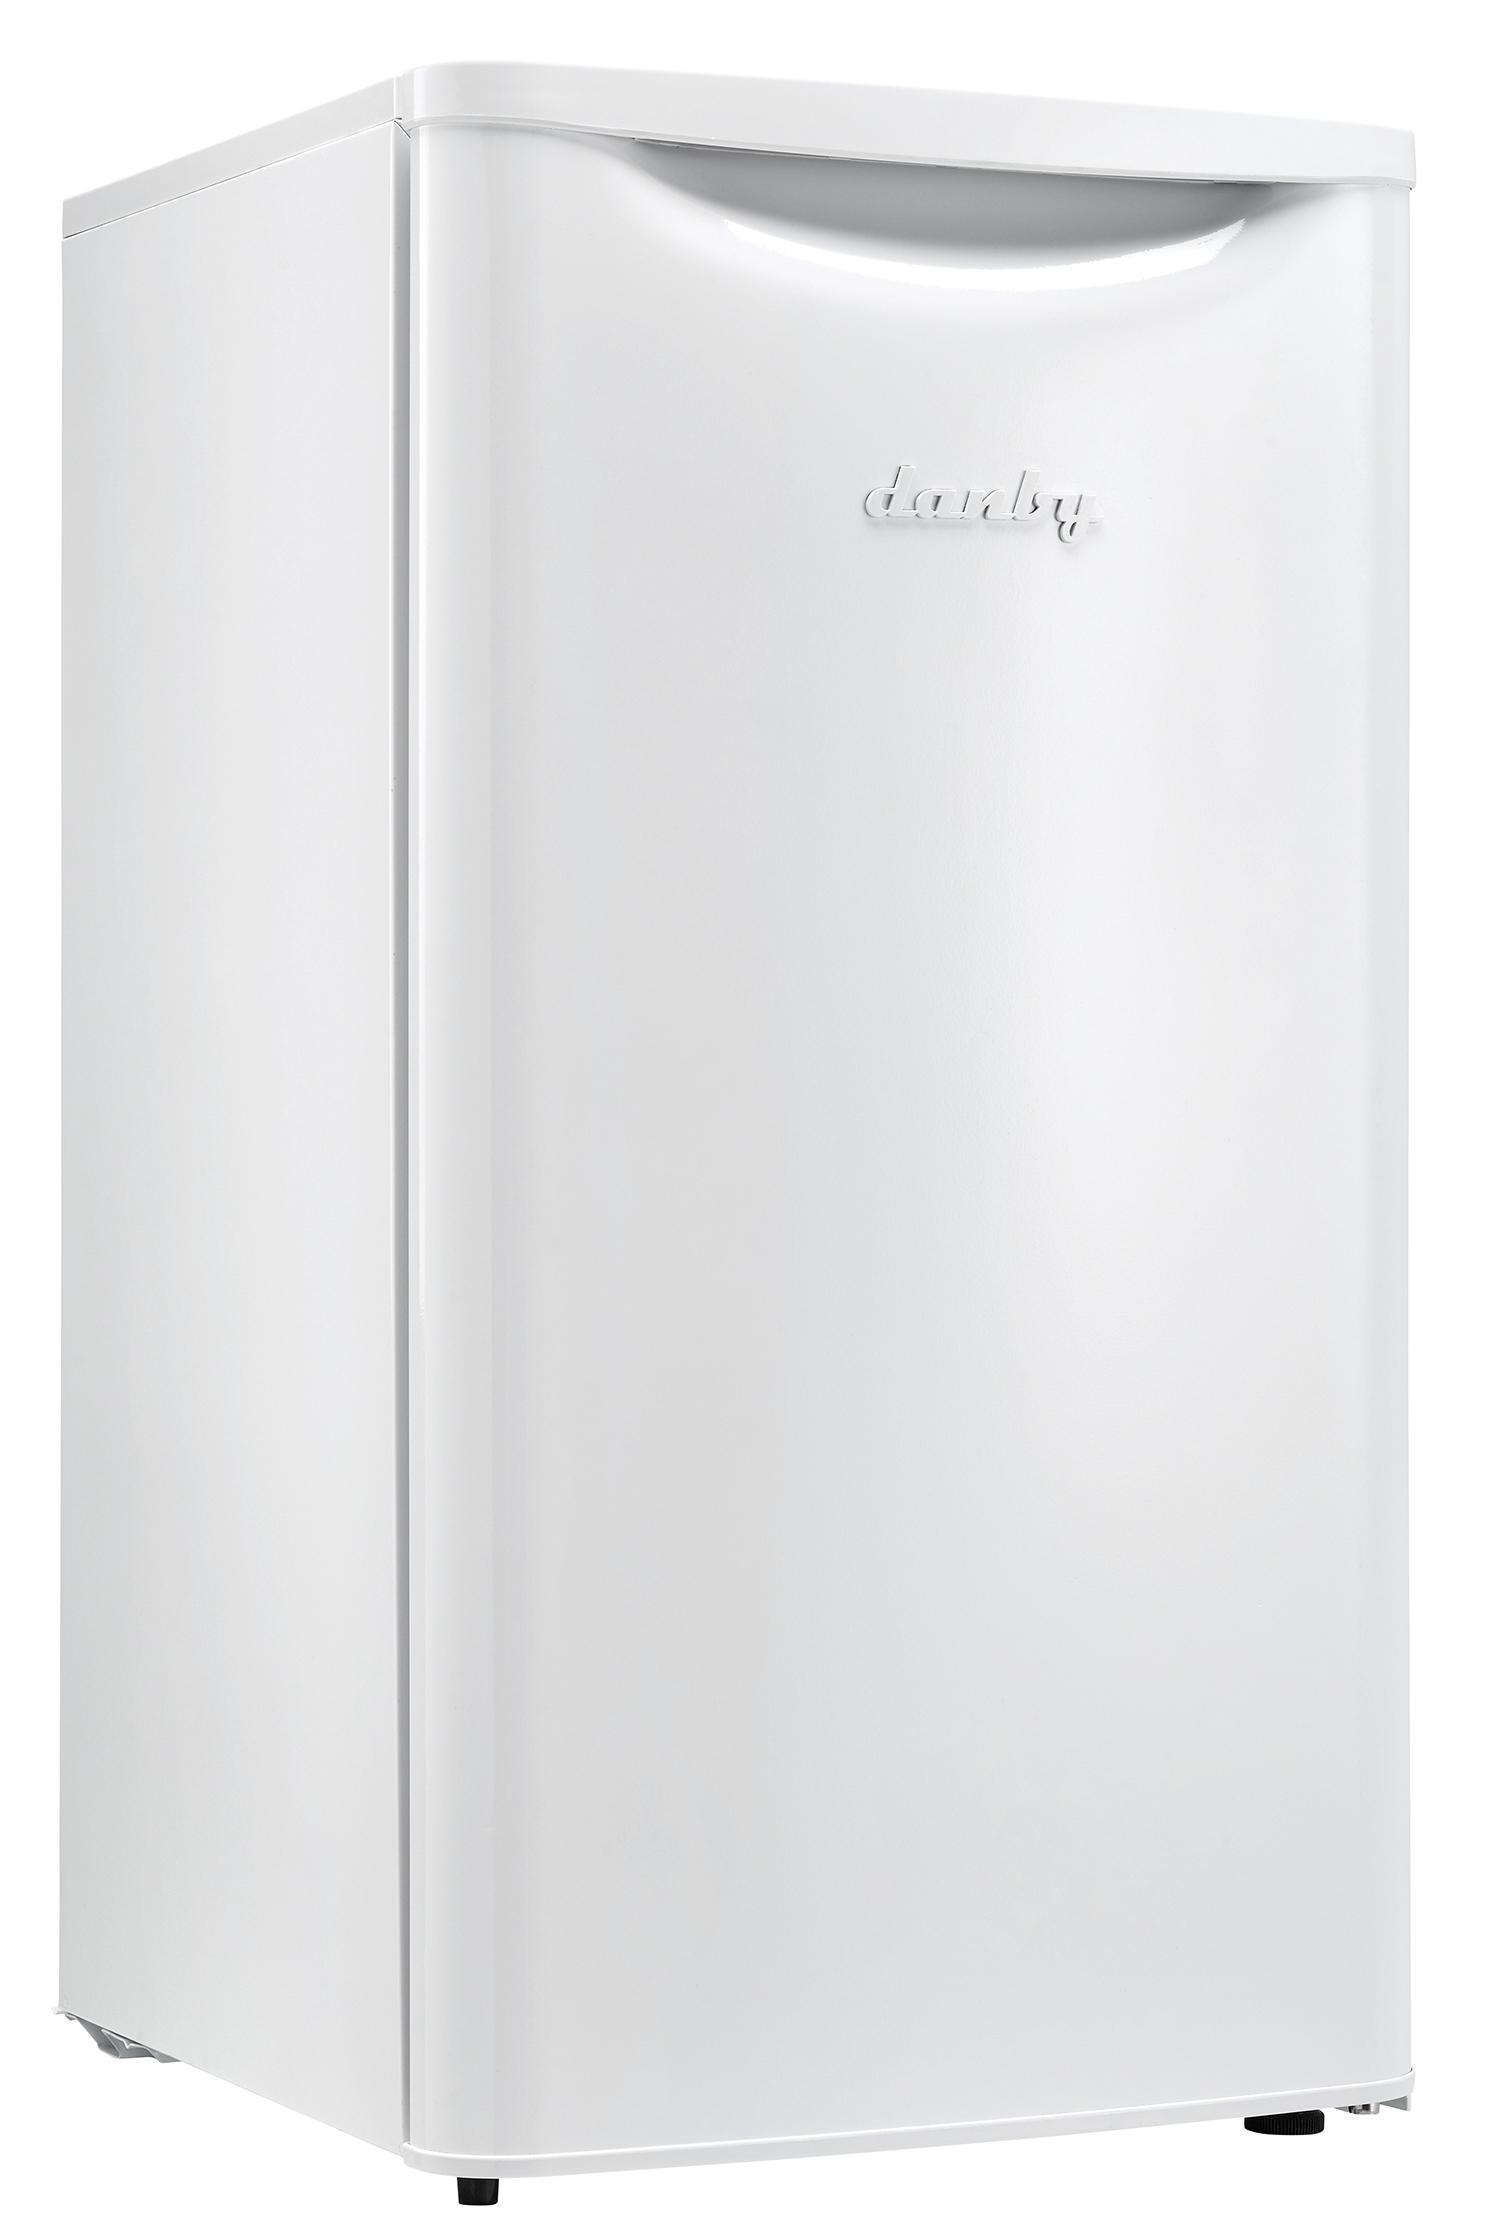 Danby Countertop Ice Maker Manual : DAR033A6WDB Danby 3.3 Cu.Ft. Compact Refrigerator EN